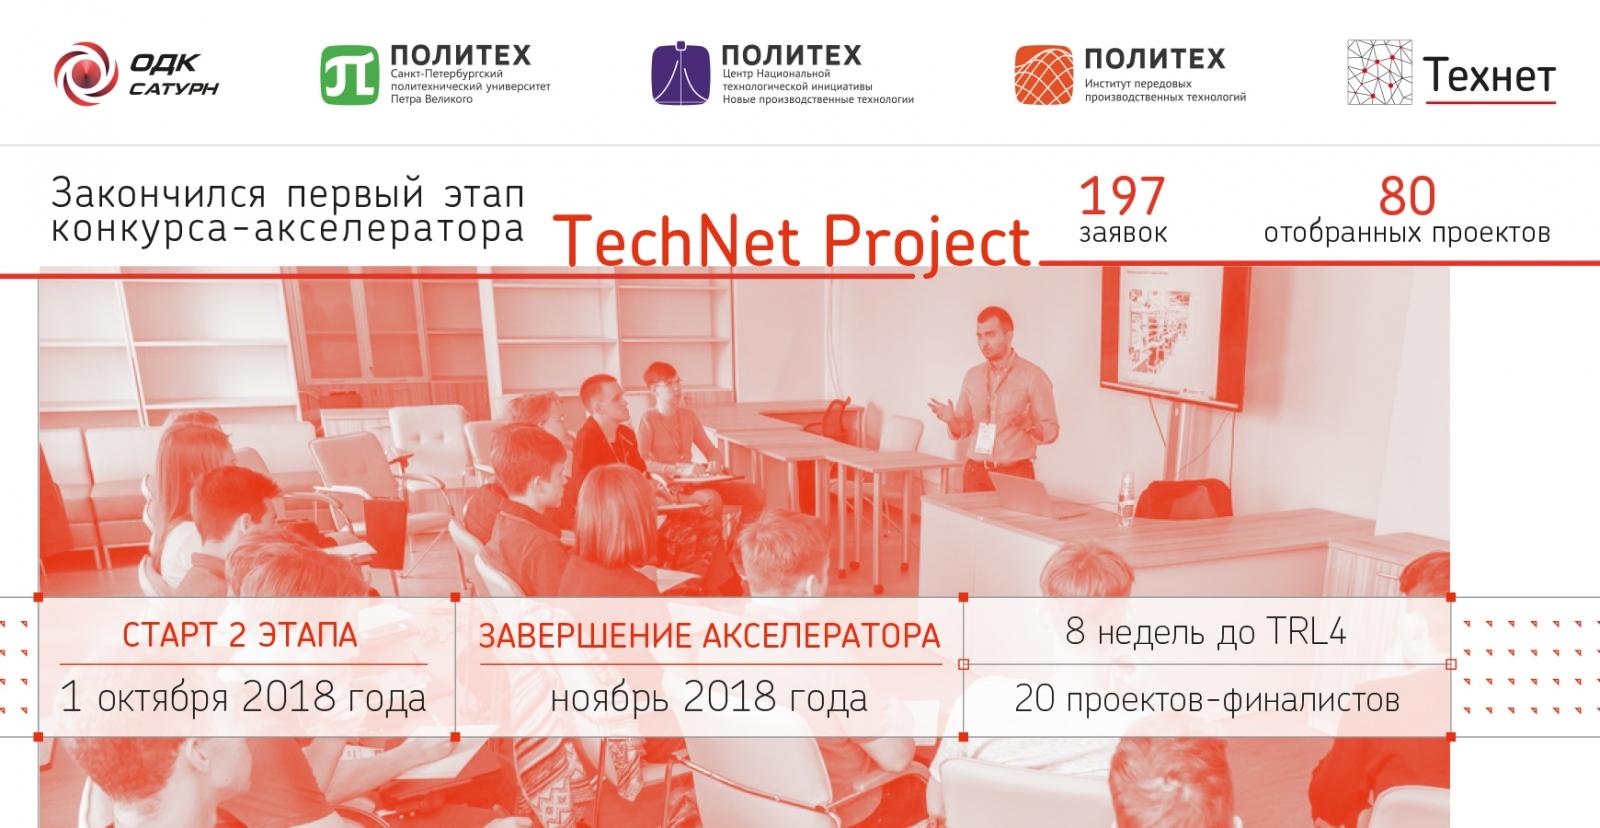 TechNet Project: старт акселерационной программы Центра НТИ СПбПУ